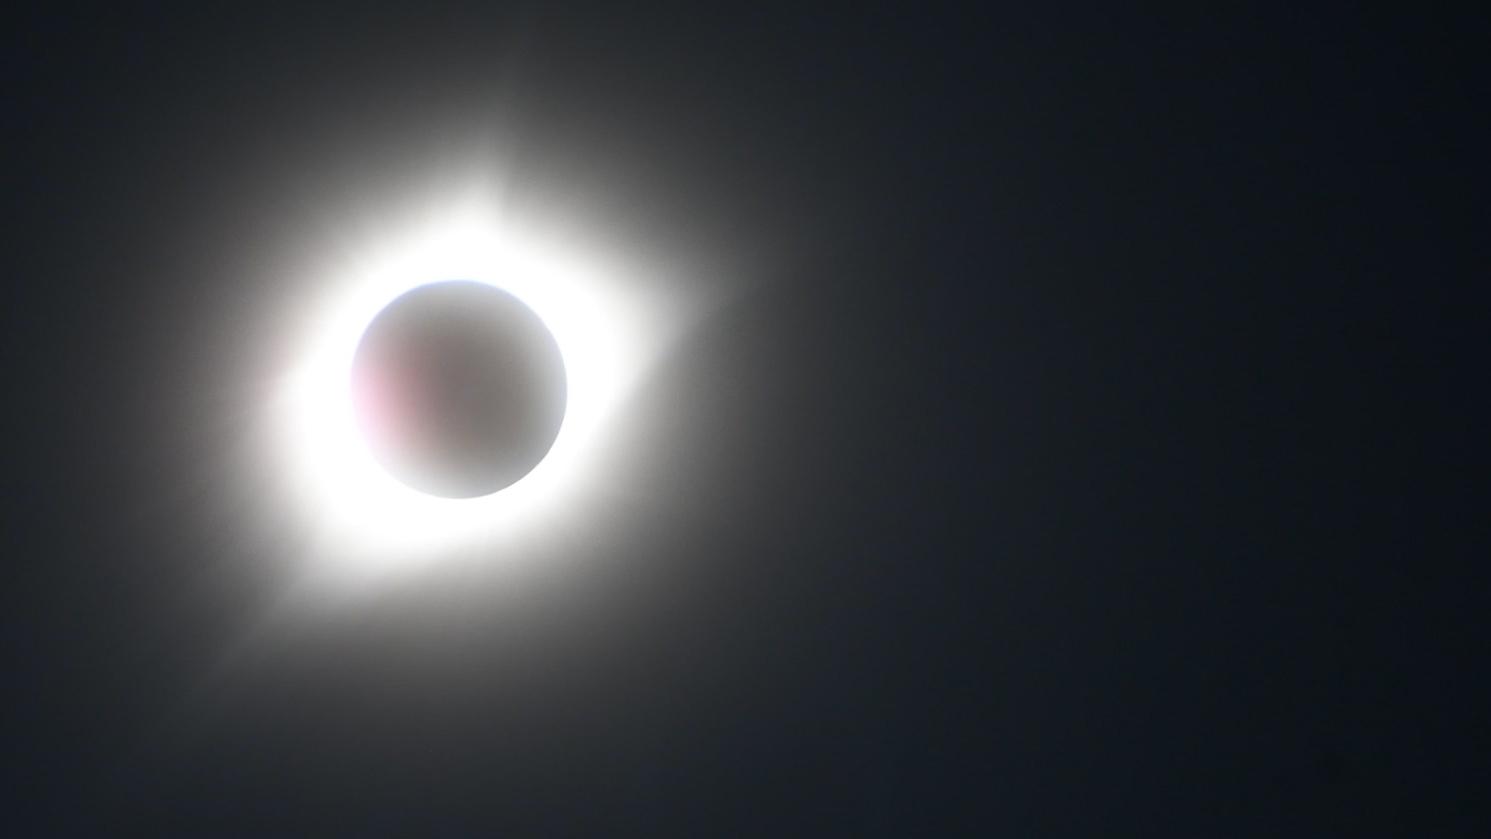 Image - Eclipse-GrandIsland-Totality.jpg